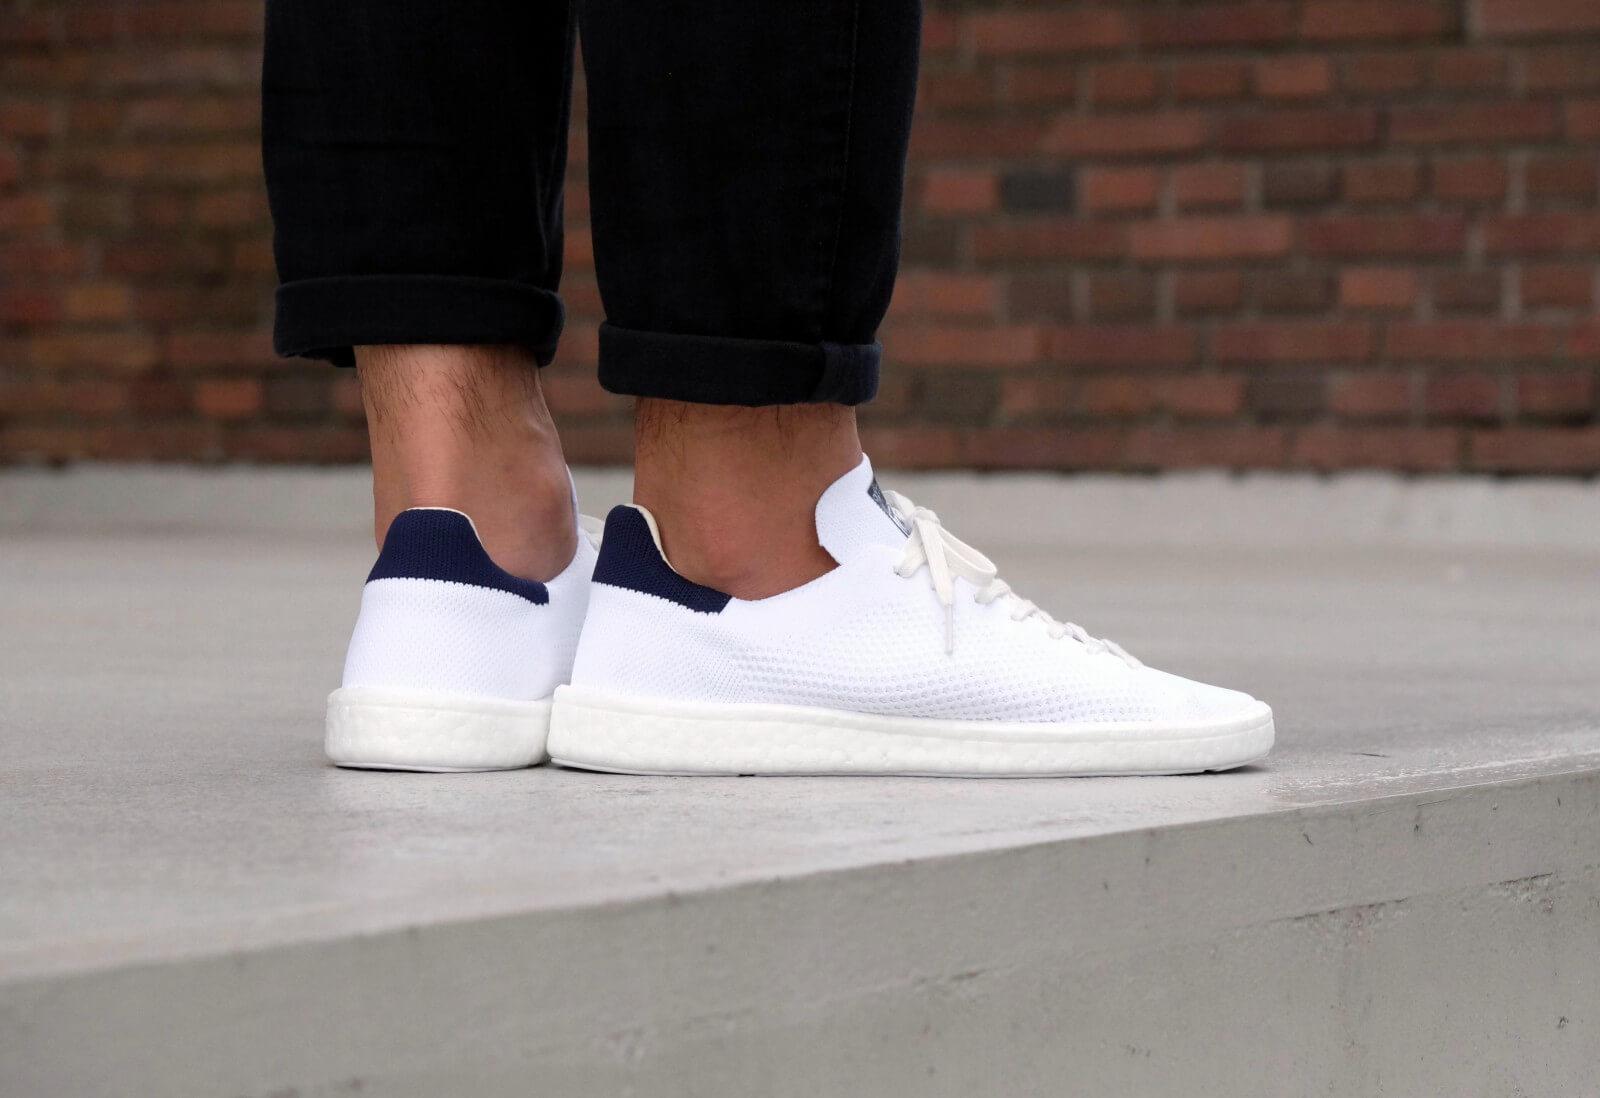 Adidas Stan Smith Boost PK Footwear White/Core White